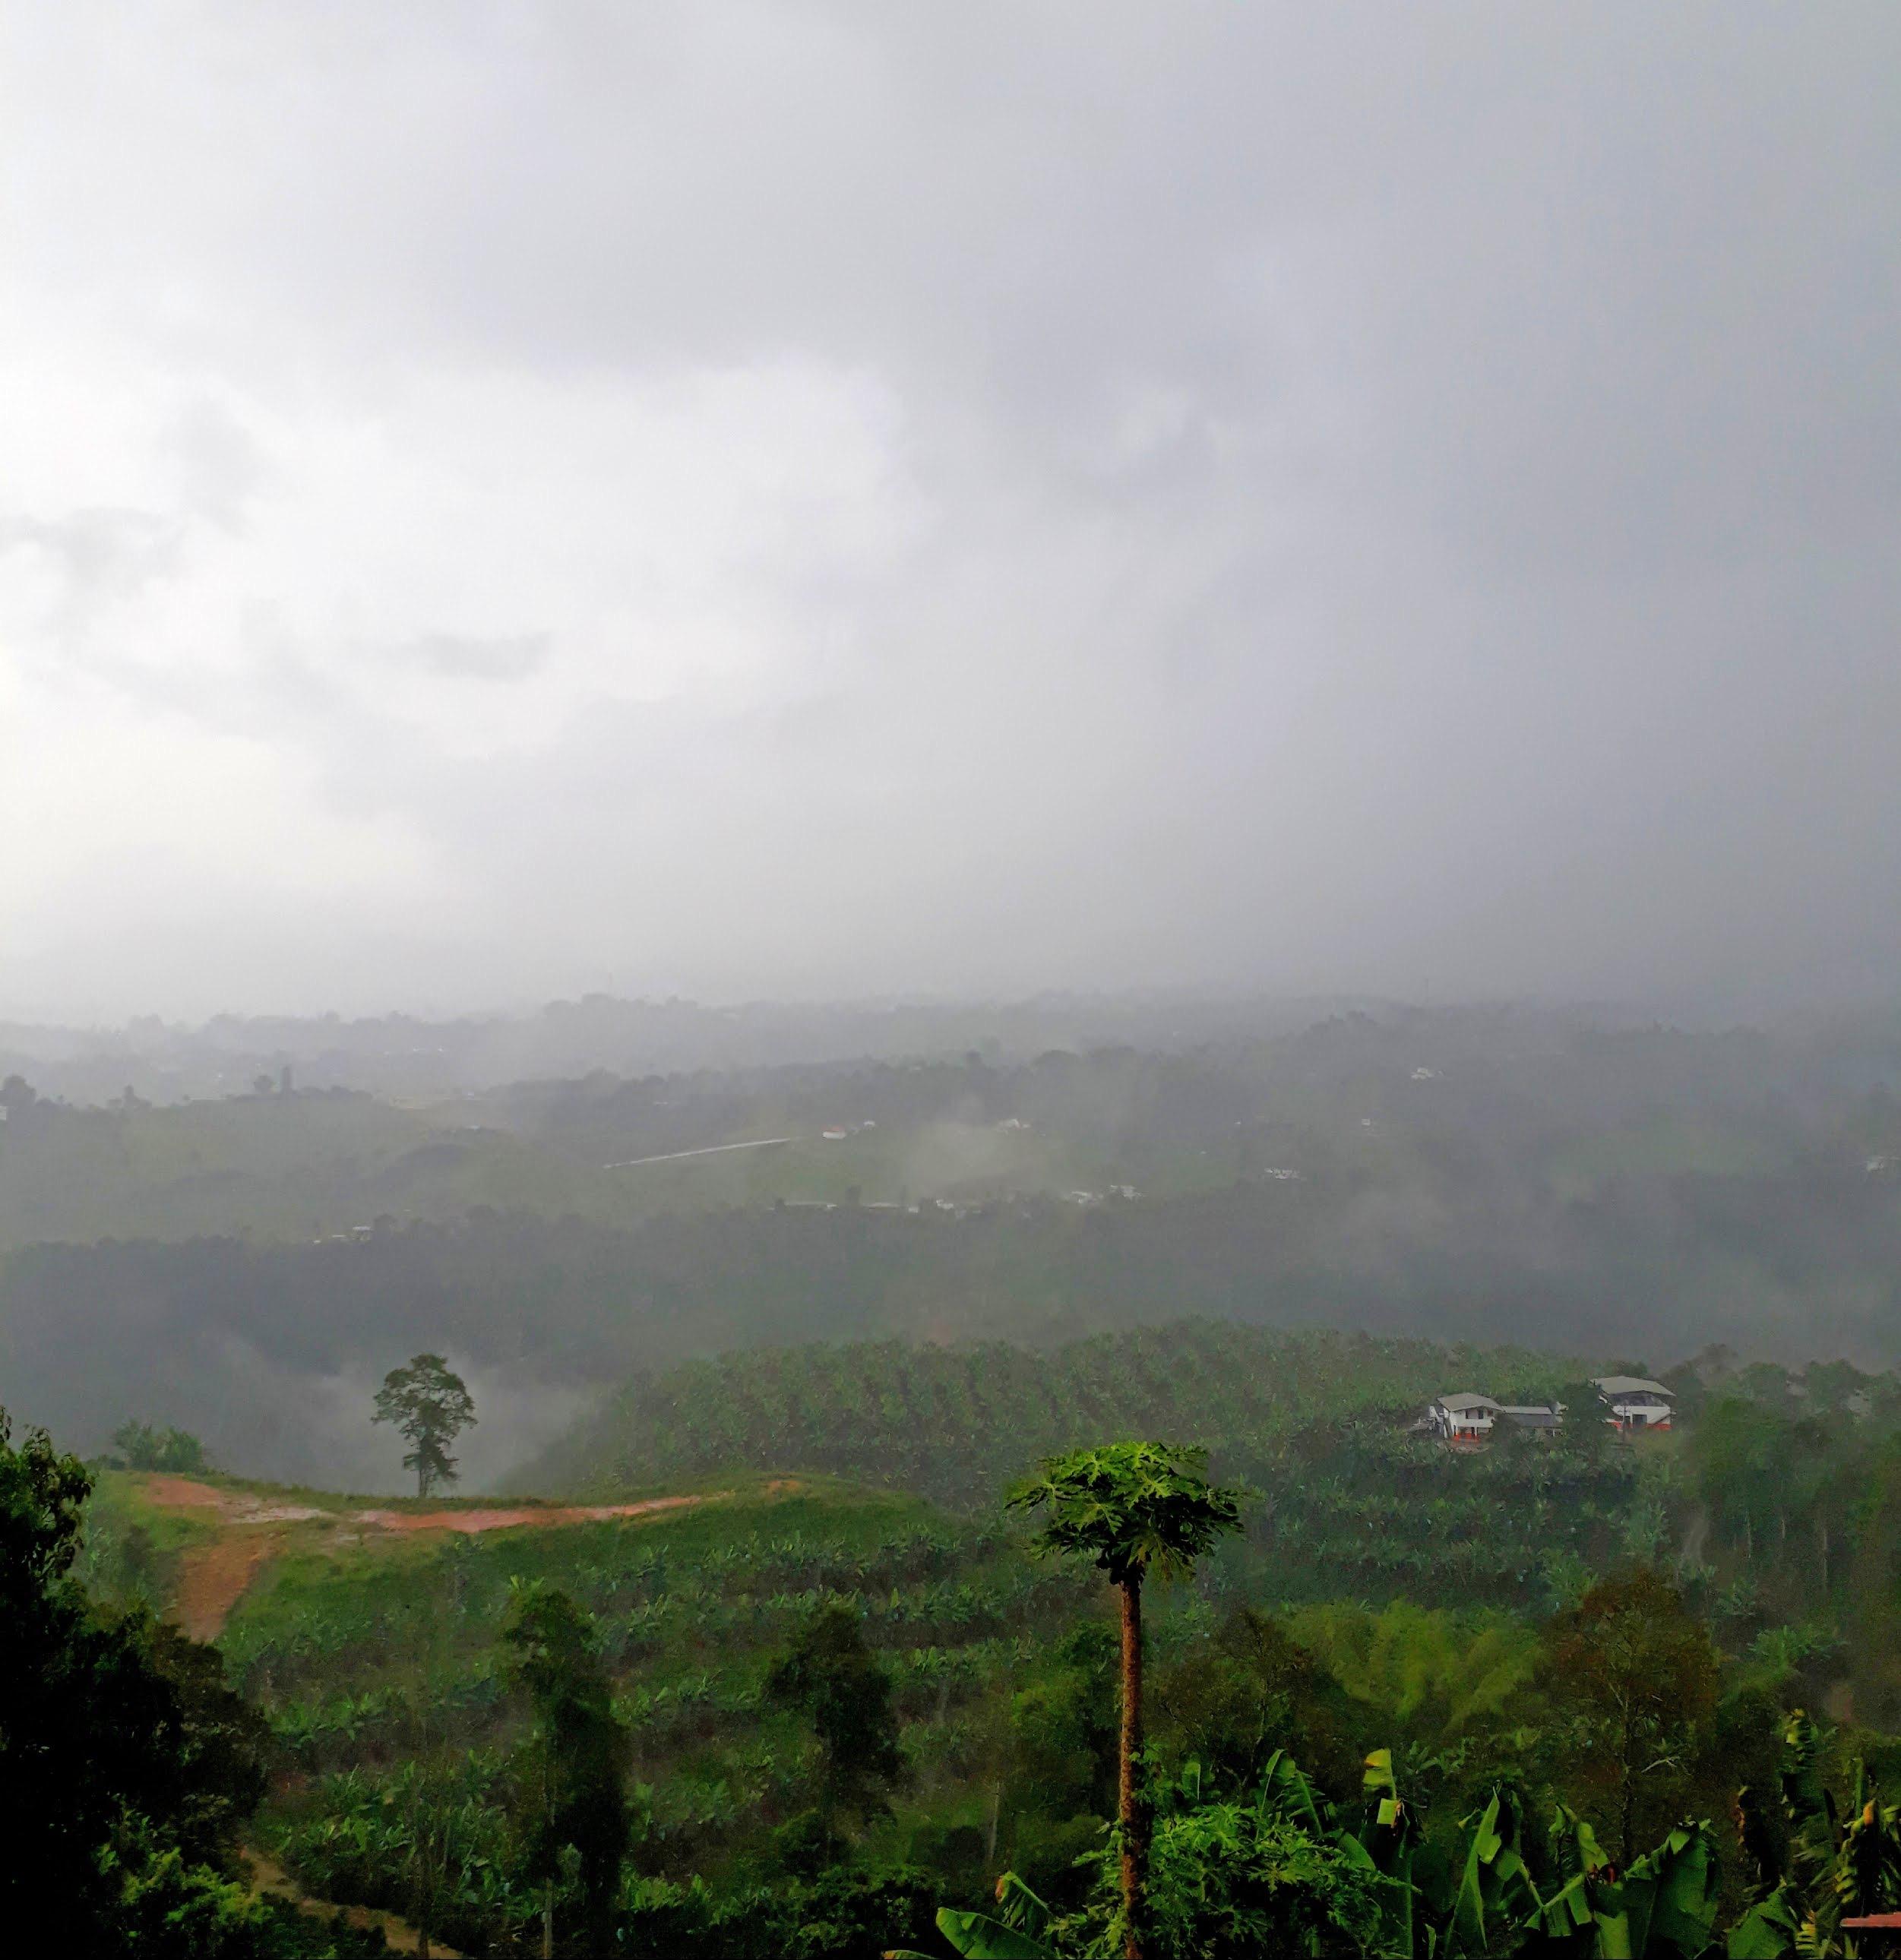 Foto de la neblina colombiana: Pereira.